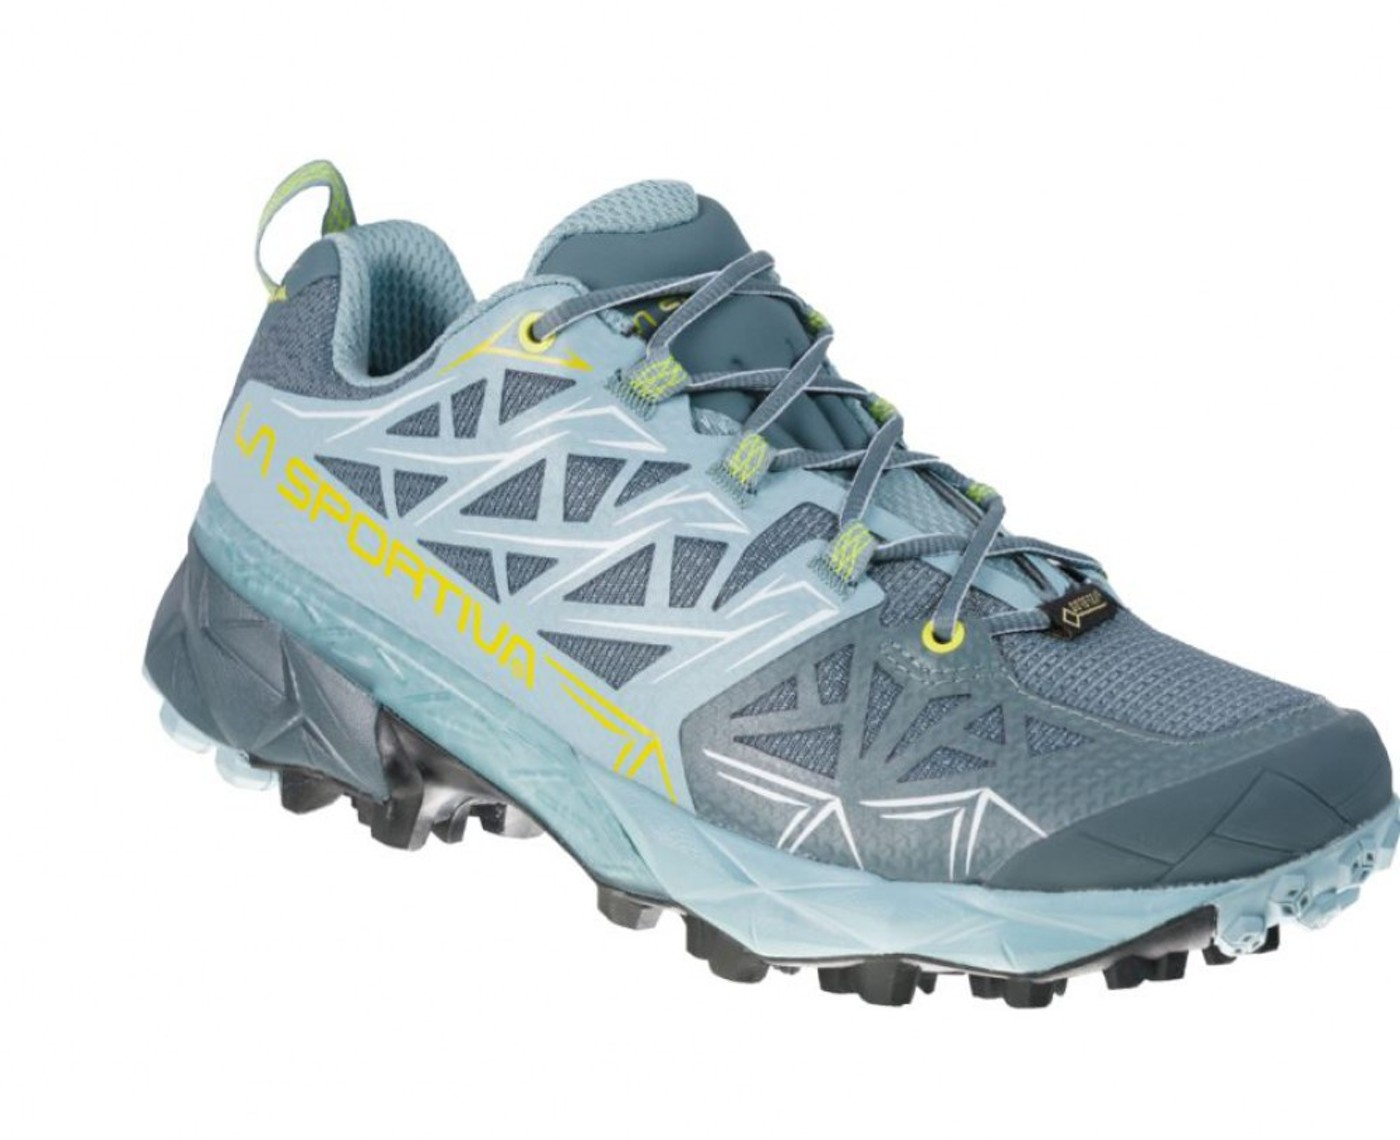 LA SPORTIVA Trail. Run. Schuh AKYRA GTX - Damen